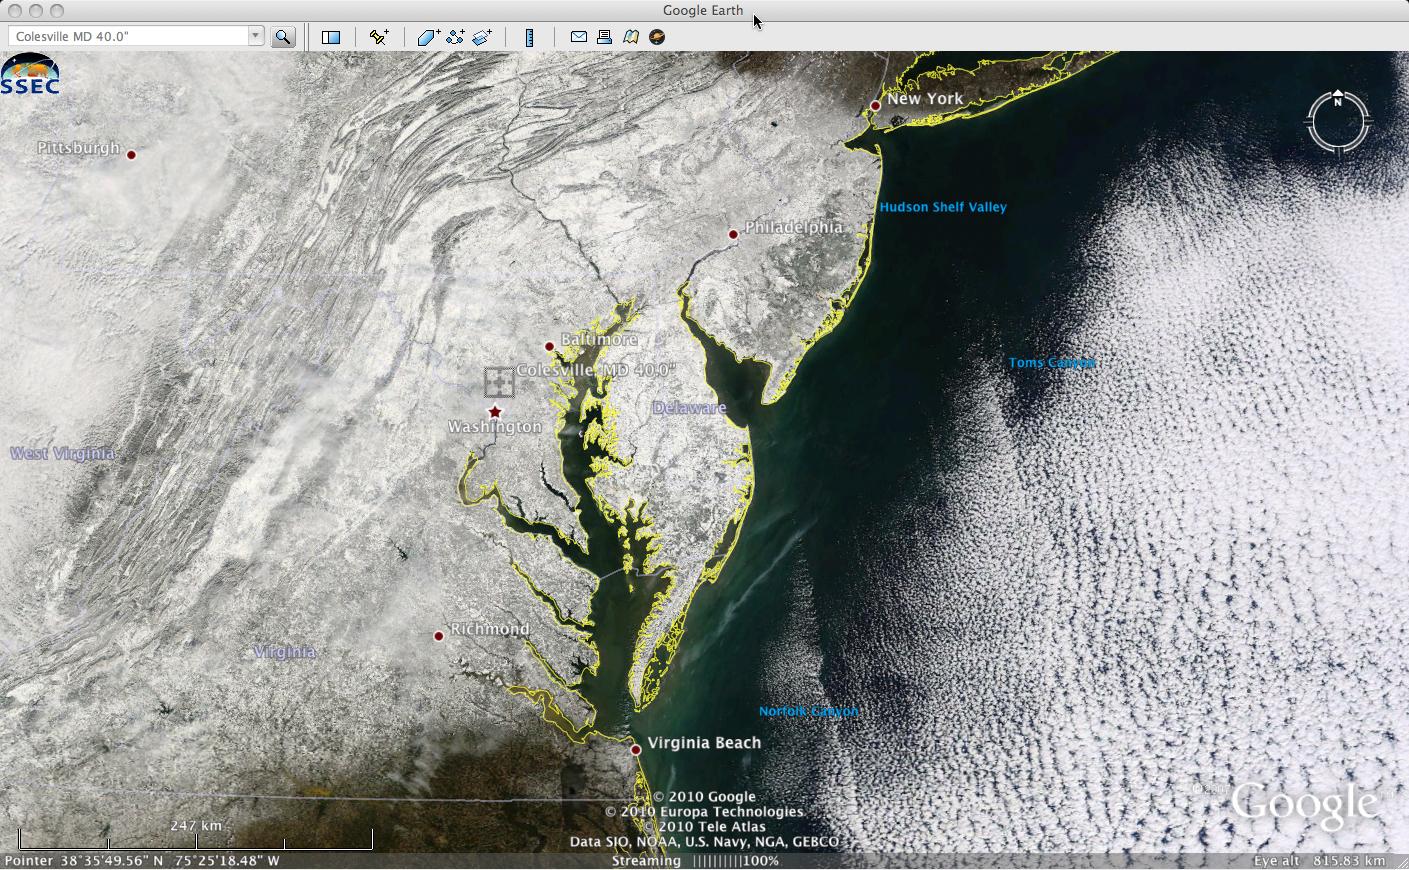 MODIS true color image (displayed using Google Earth)